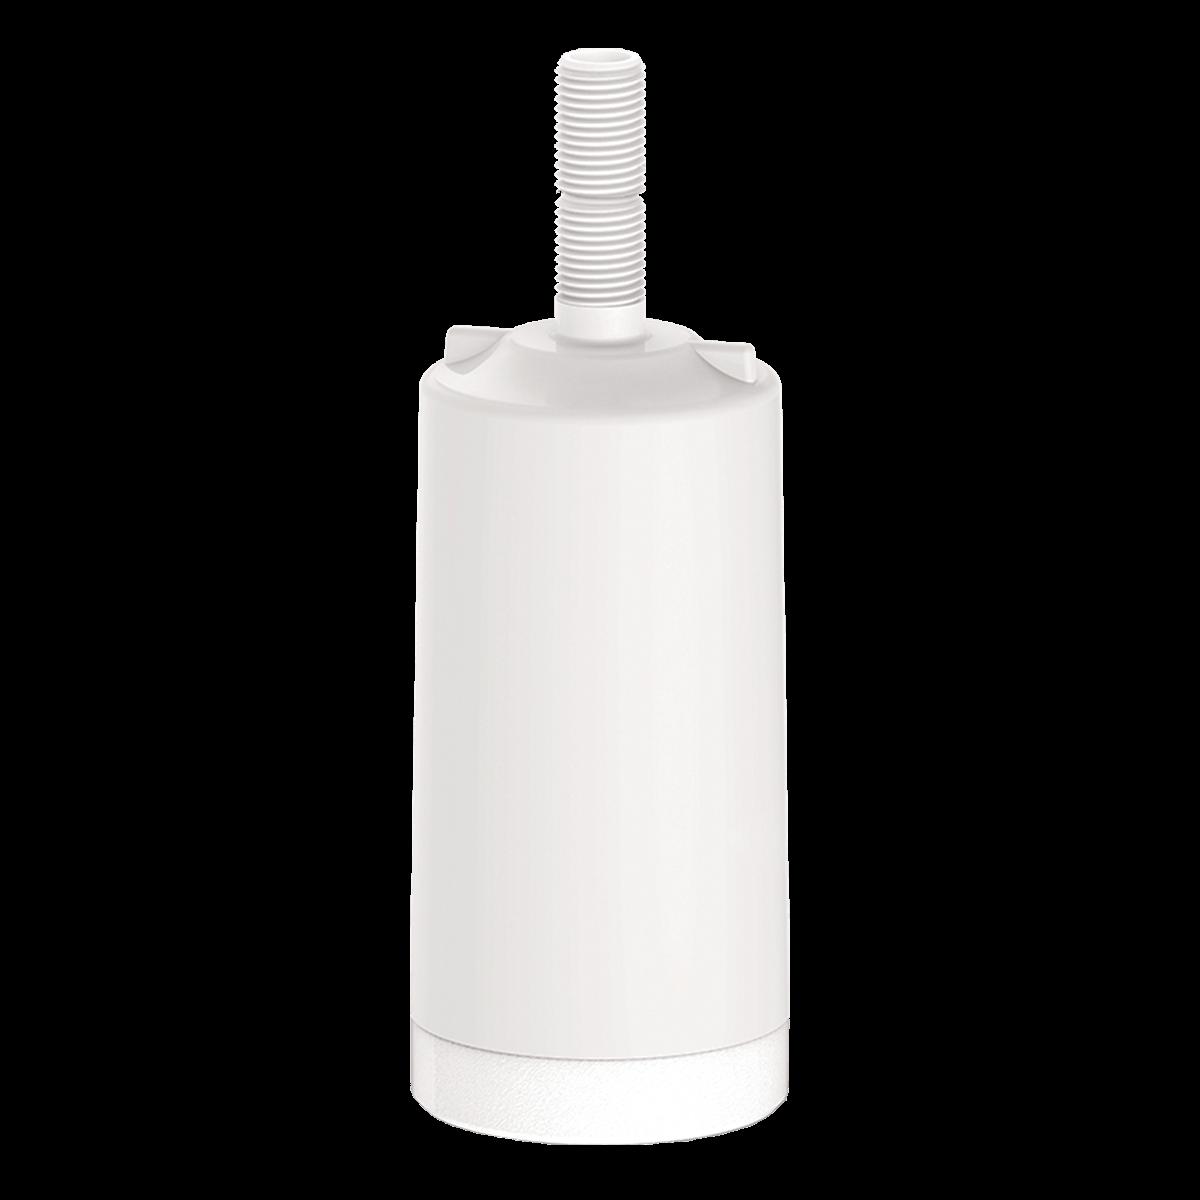 Refil de Filtro Universal Rosca Longa  - DOTEC SHOP